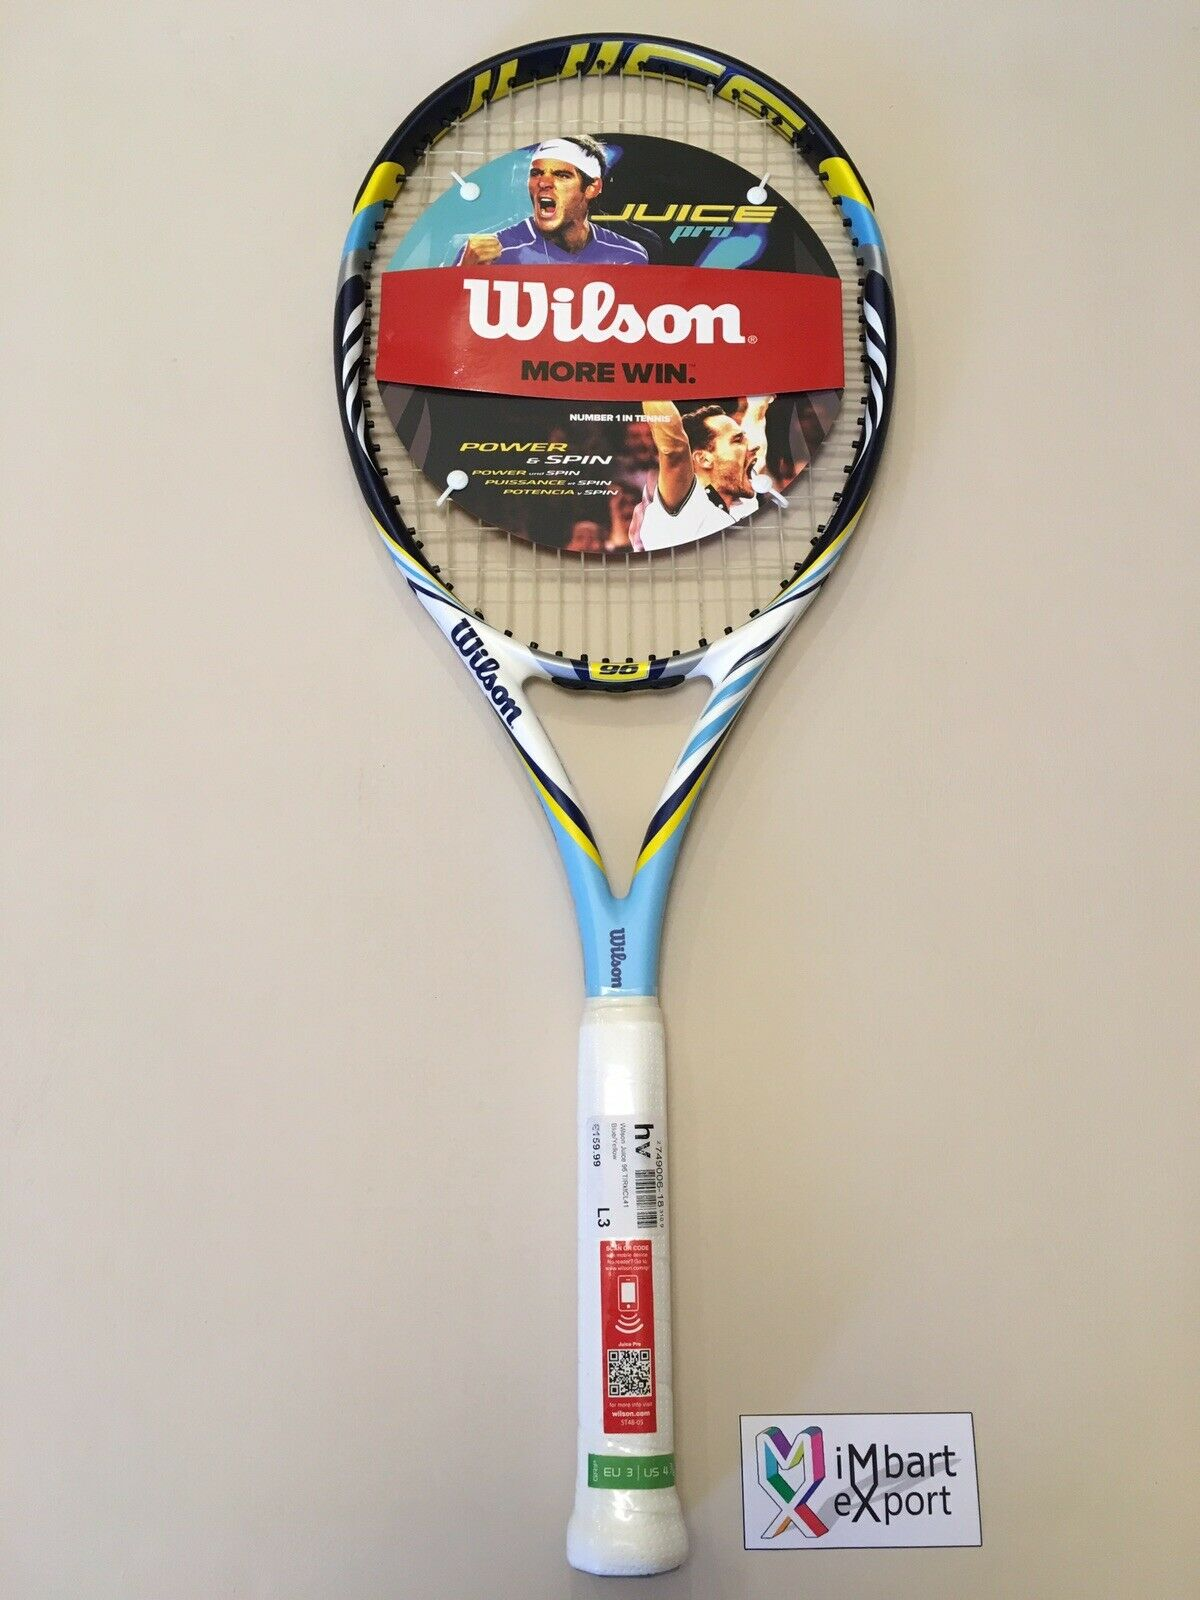 WILSON BLX JUICE PRO 96 16x20 324 L3 Del Potro Racchetta Tennis Racket